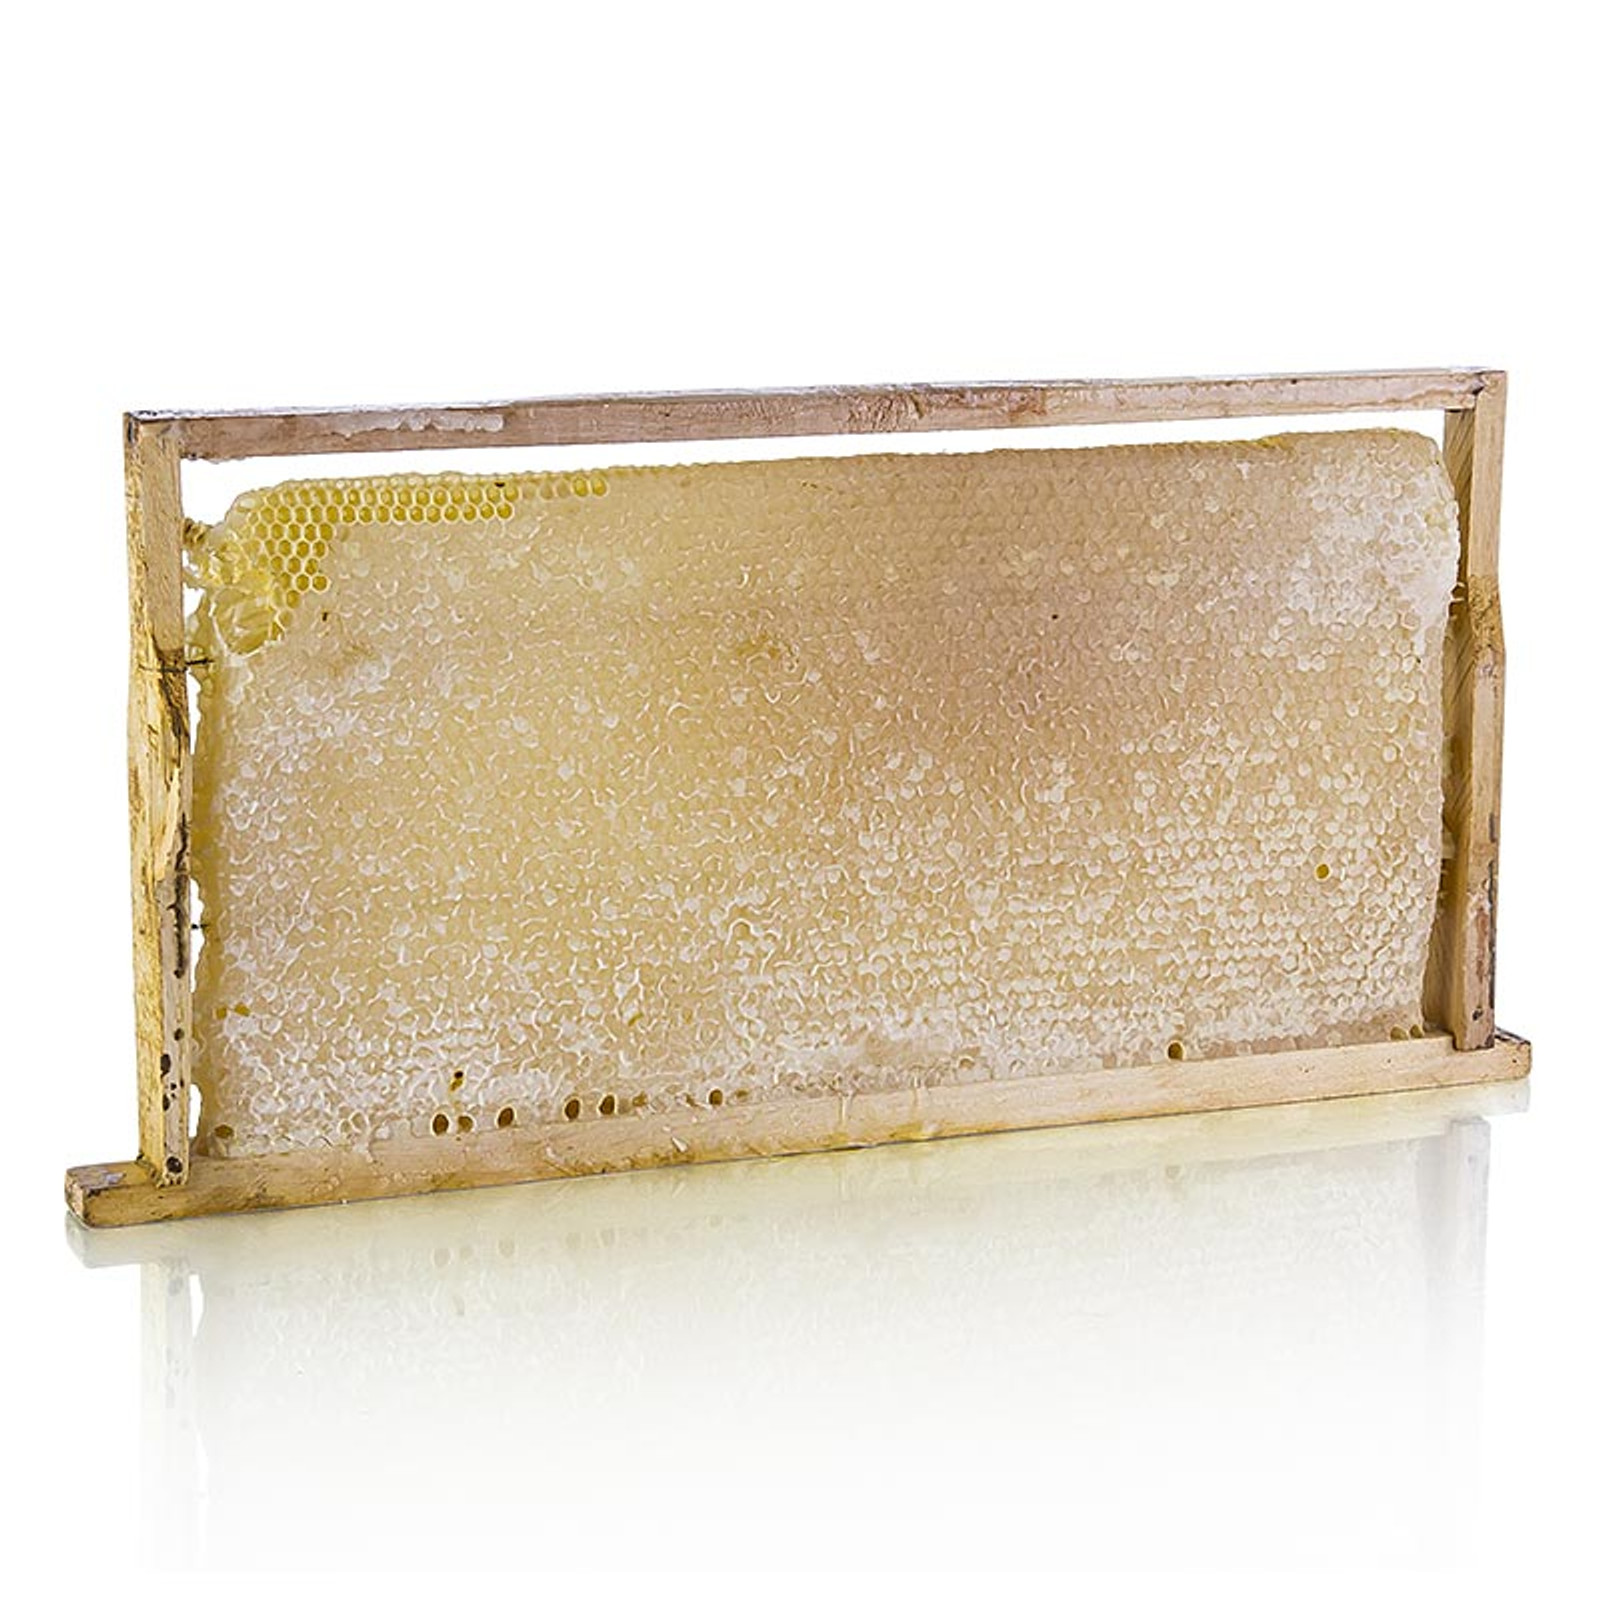 bienen waben in honig im holzrahmen t rkei ca 3 5 kg s ss salzig honig konfit re honig. Black Bedroom Furniture Sets. Home Design Ideas